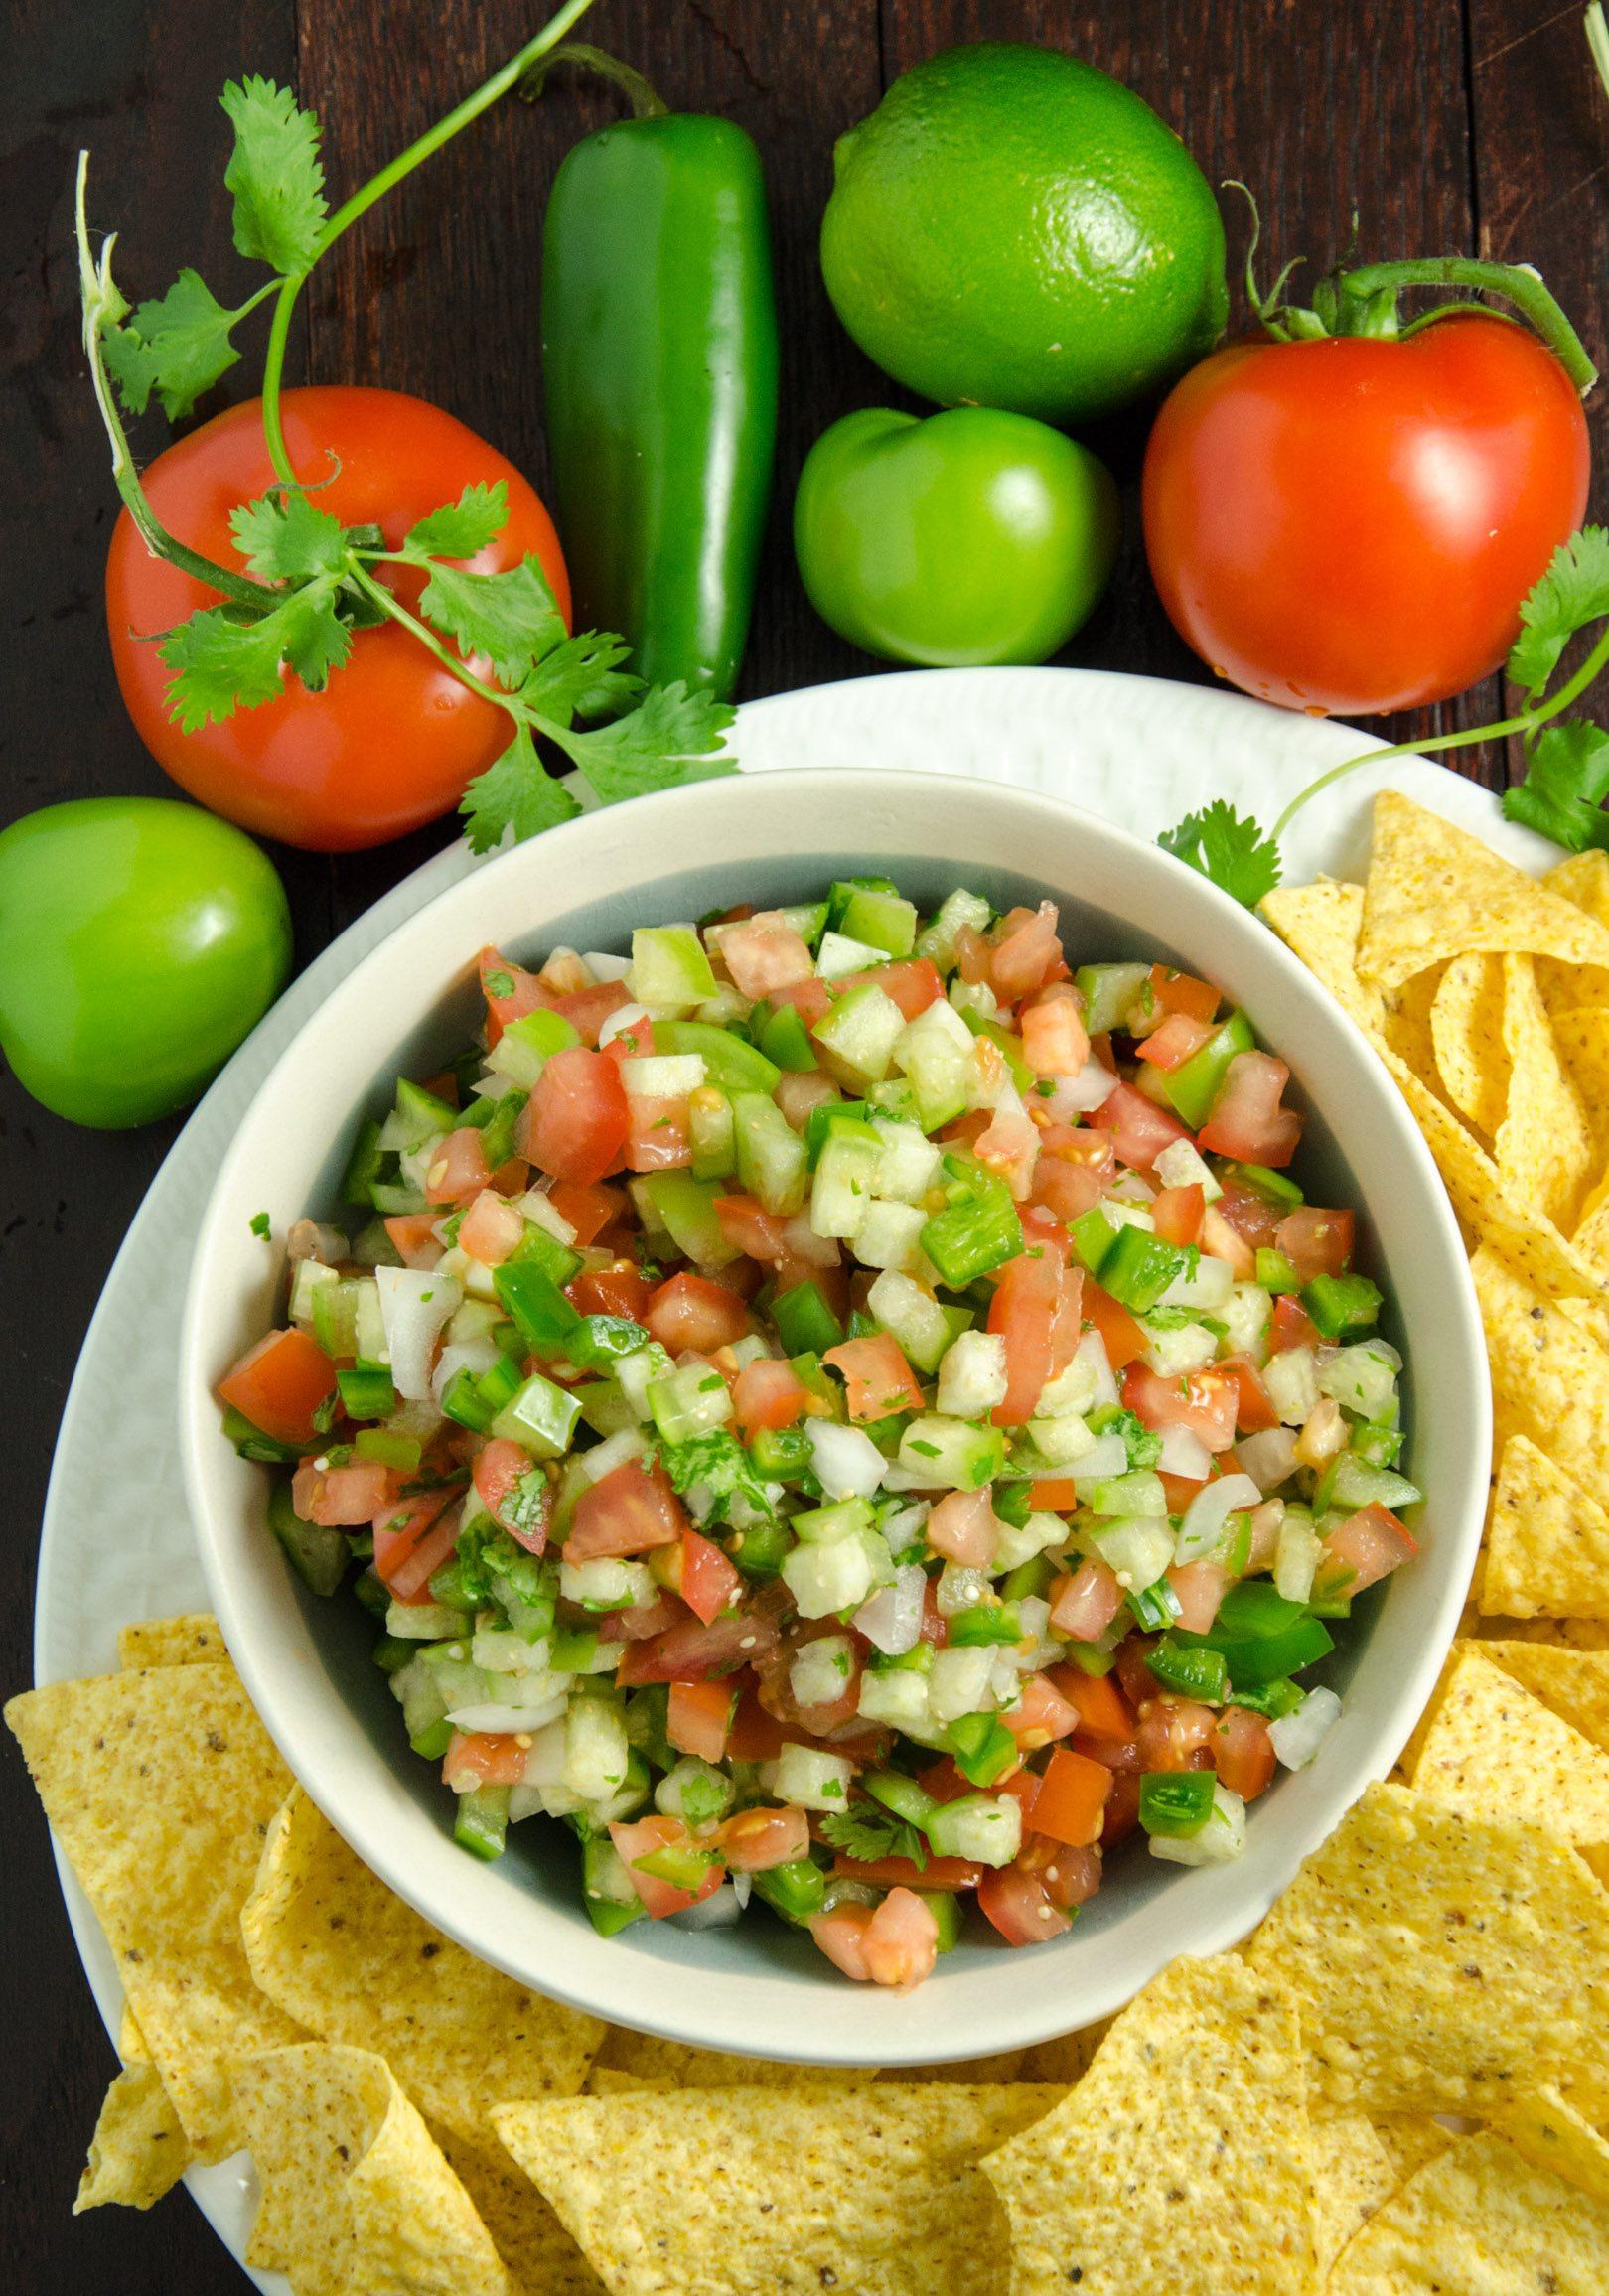 Homemade Pico de Gallo Recipe (aka Salsa Fresca). Fabulous, versatile combination of garden-fresh vegetables. Eat with chips, on salad, tacos, & more.